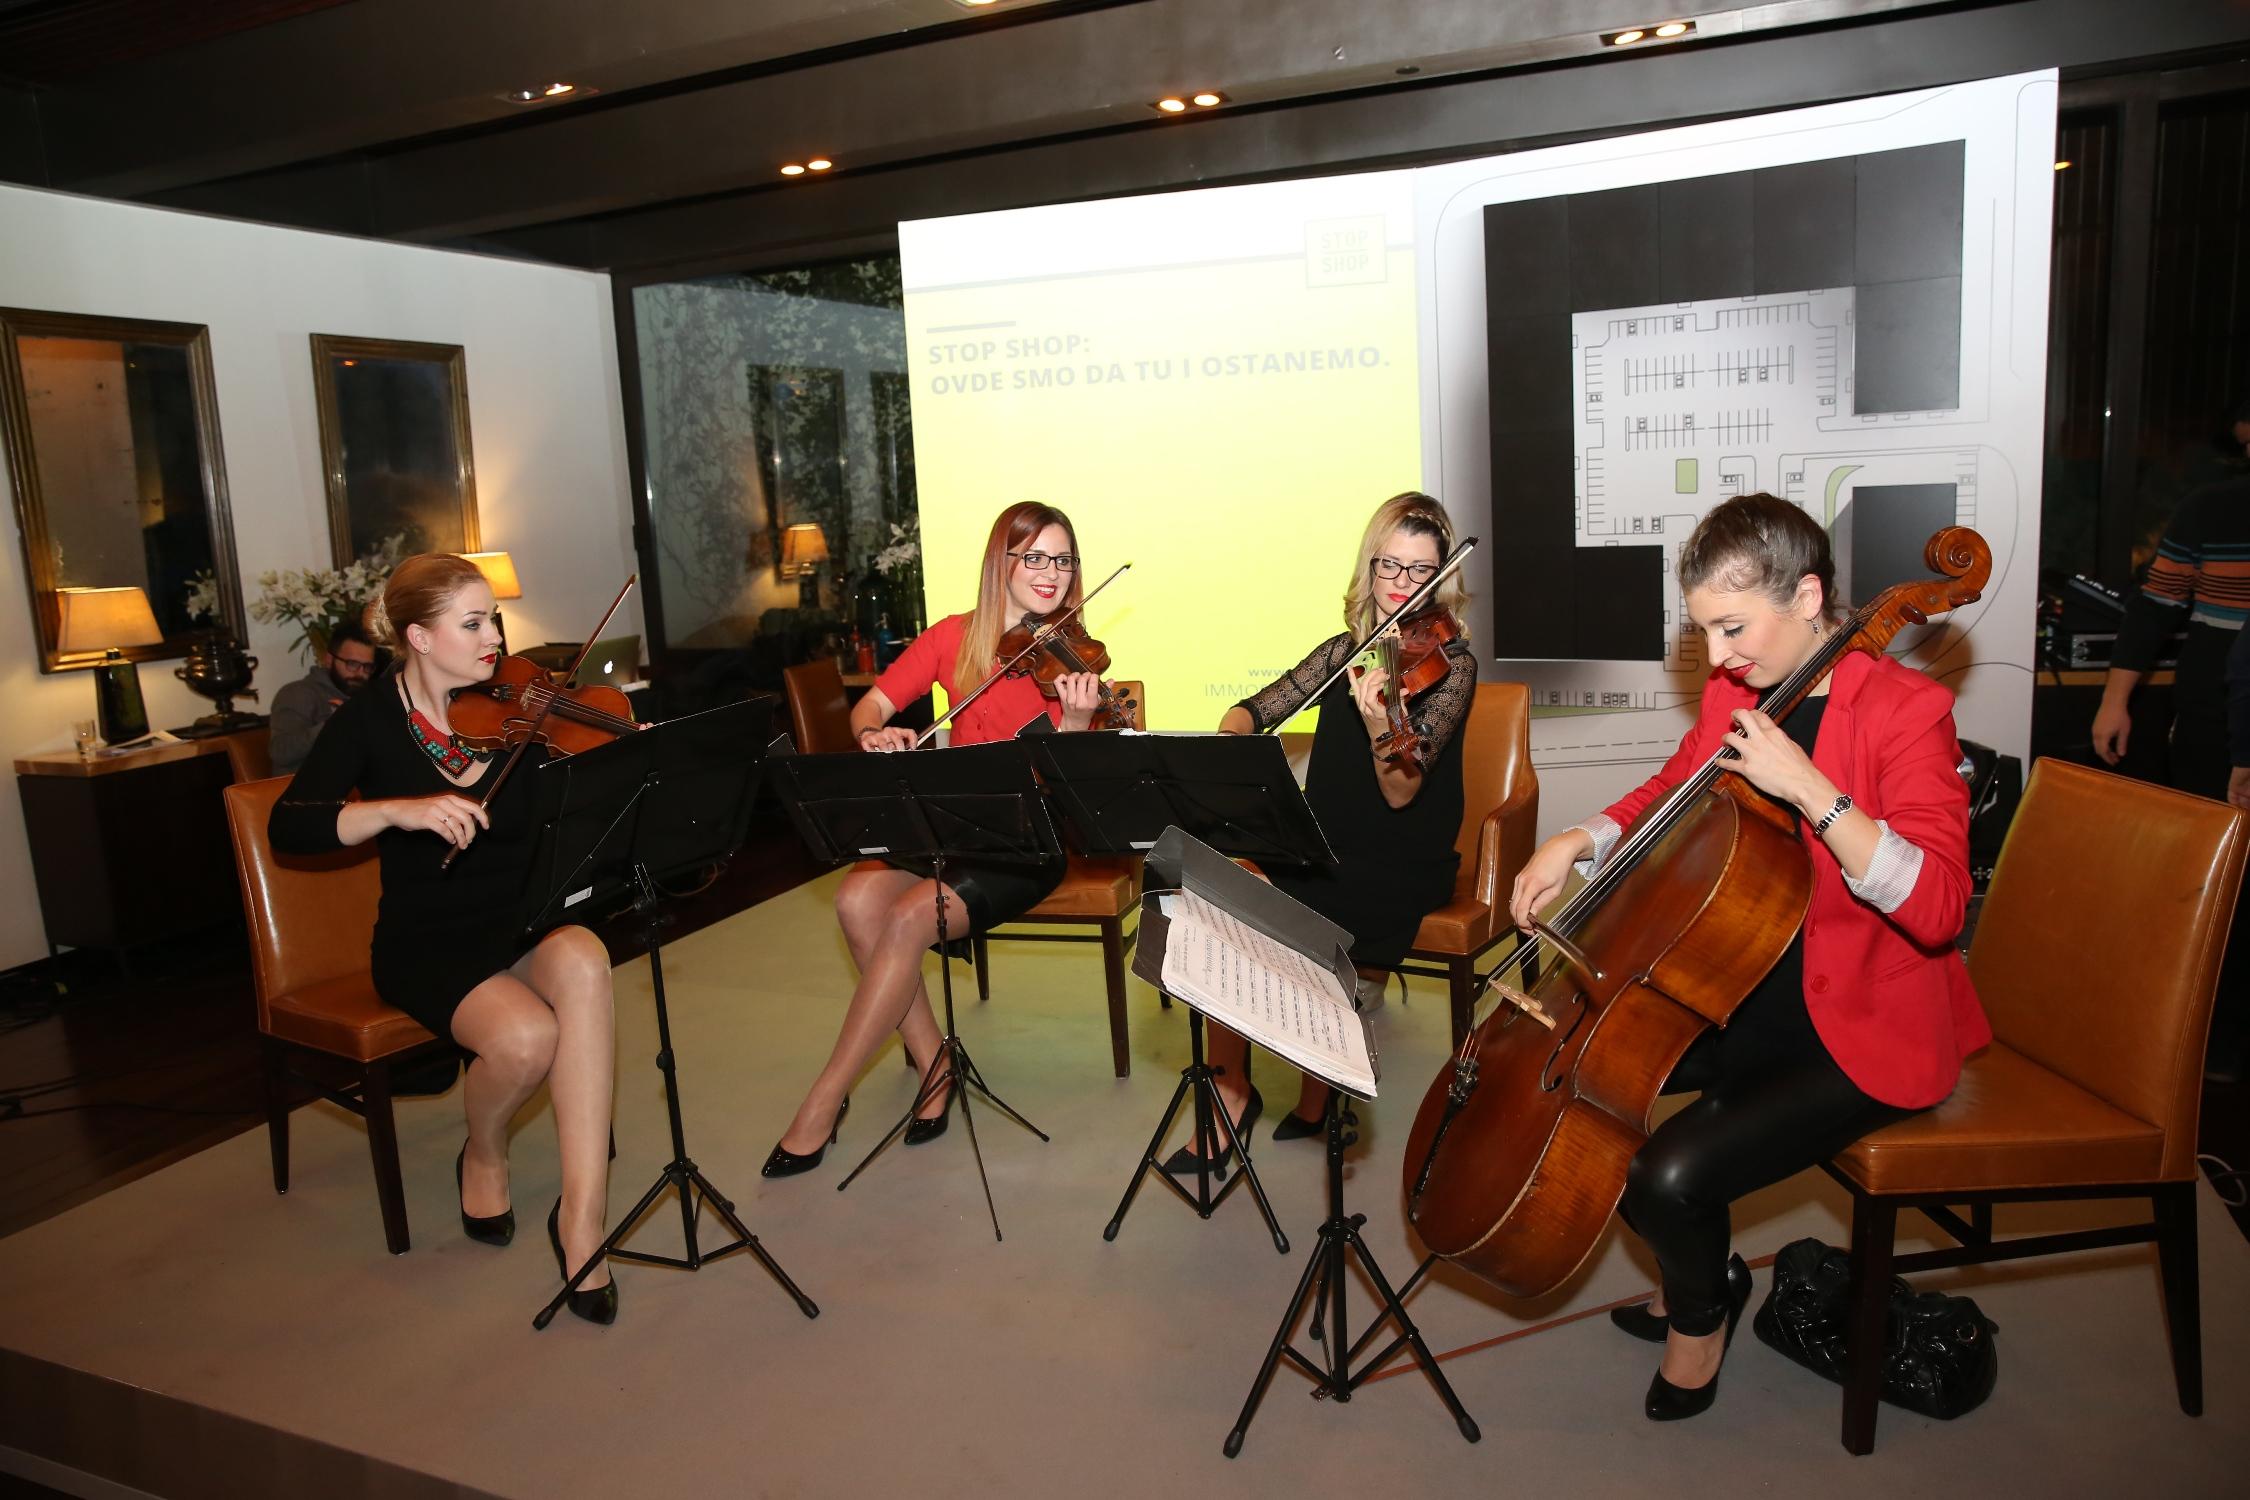 Gudacki kvartet, Event, Proslava, Promocija, Square Nine Hotel, Dogadjaj